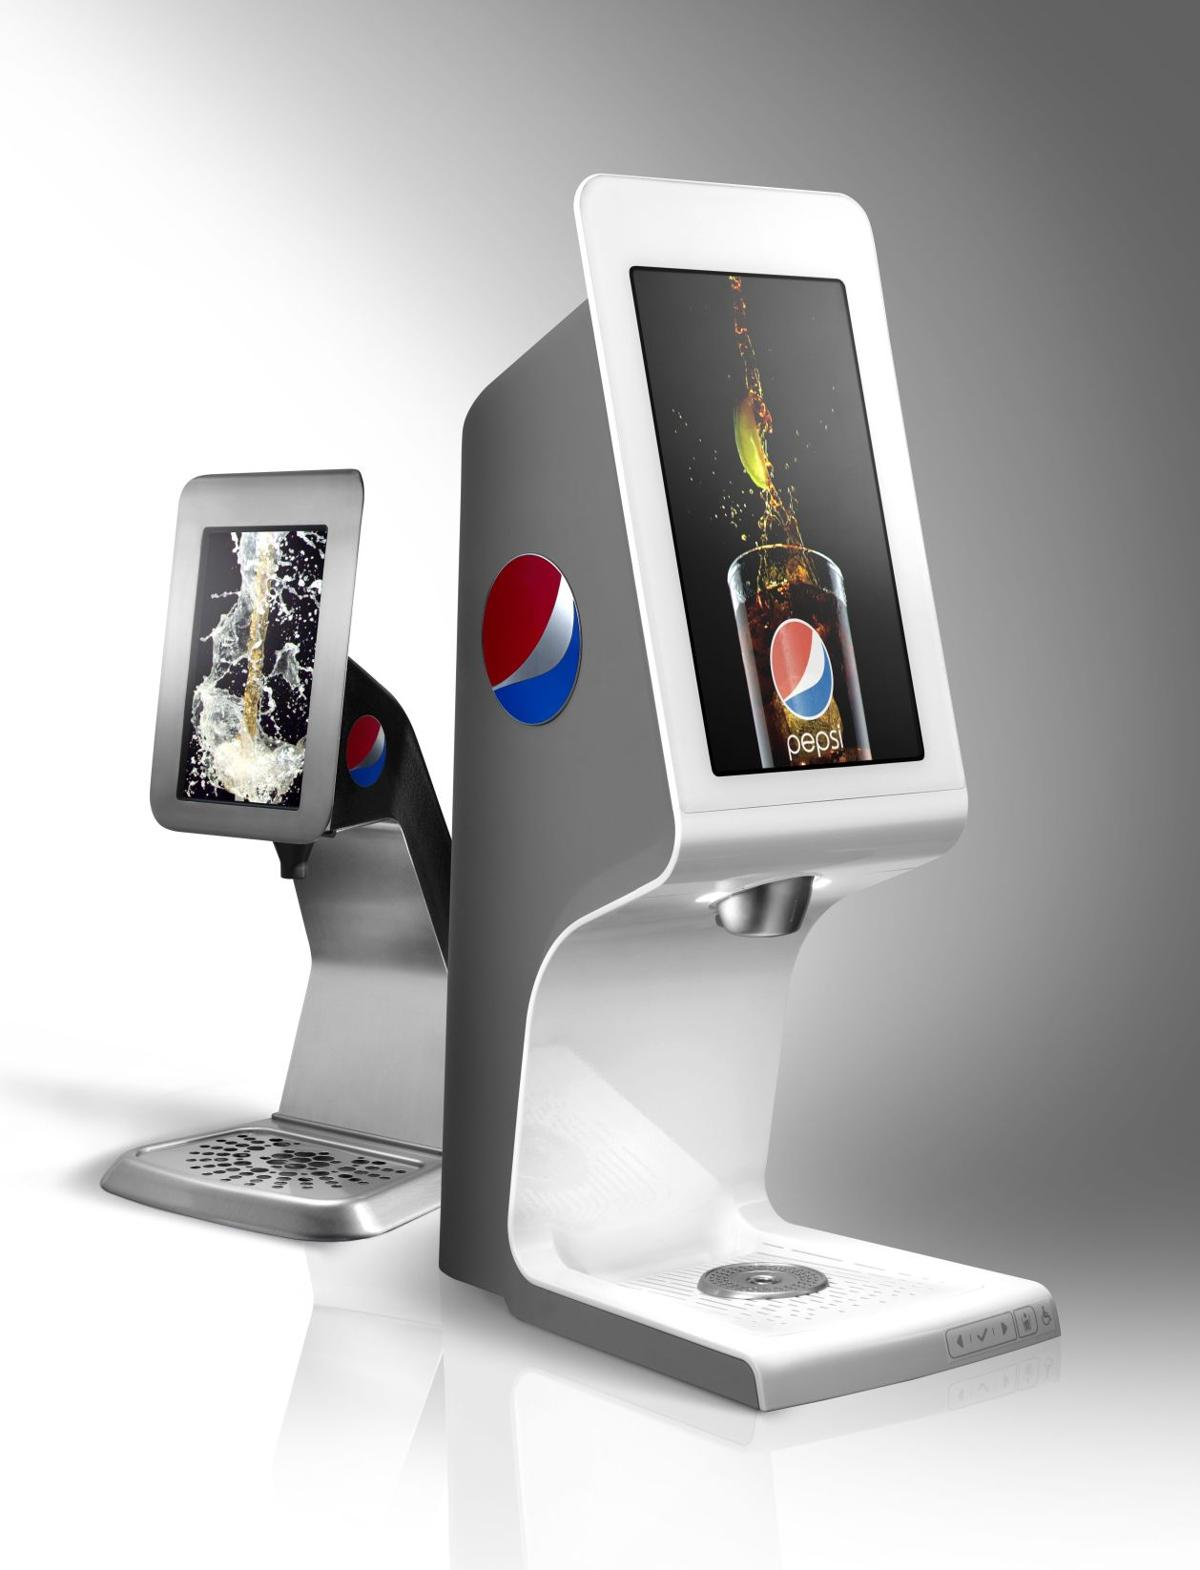 Strawberry Pepsi? New fountain machine in test